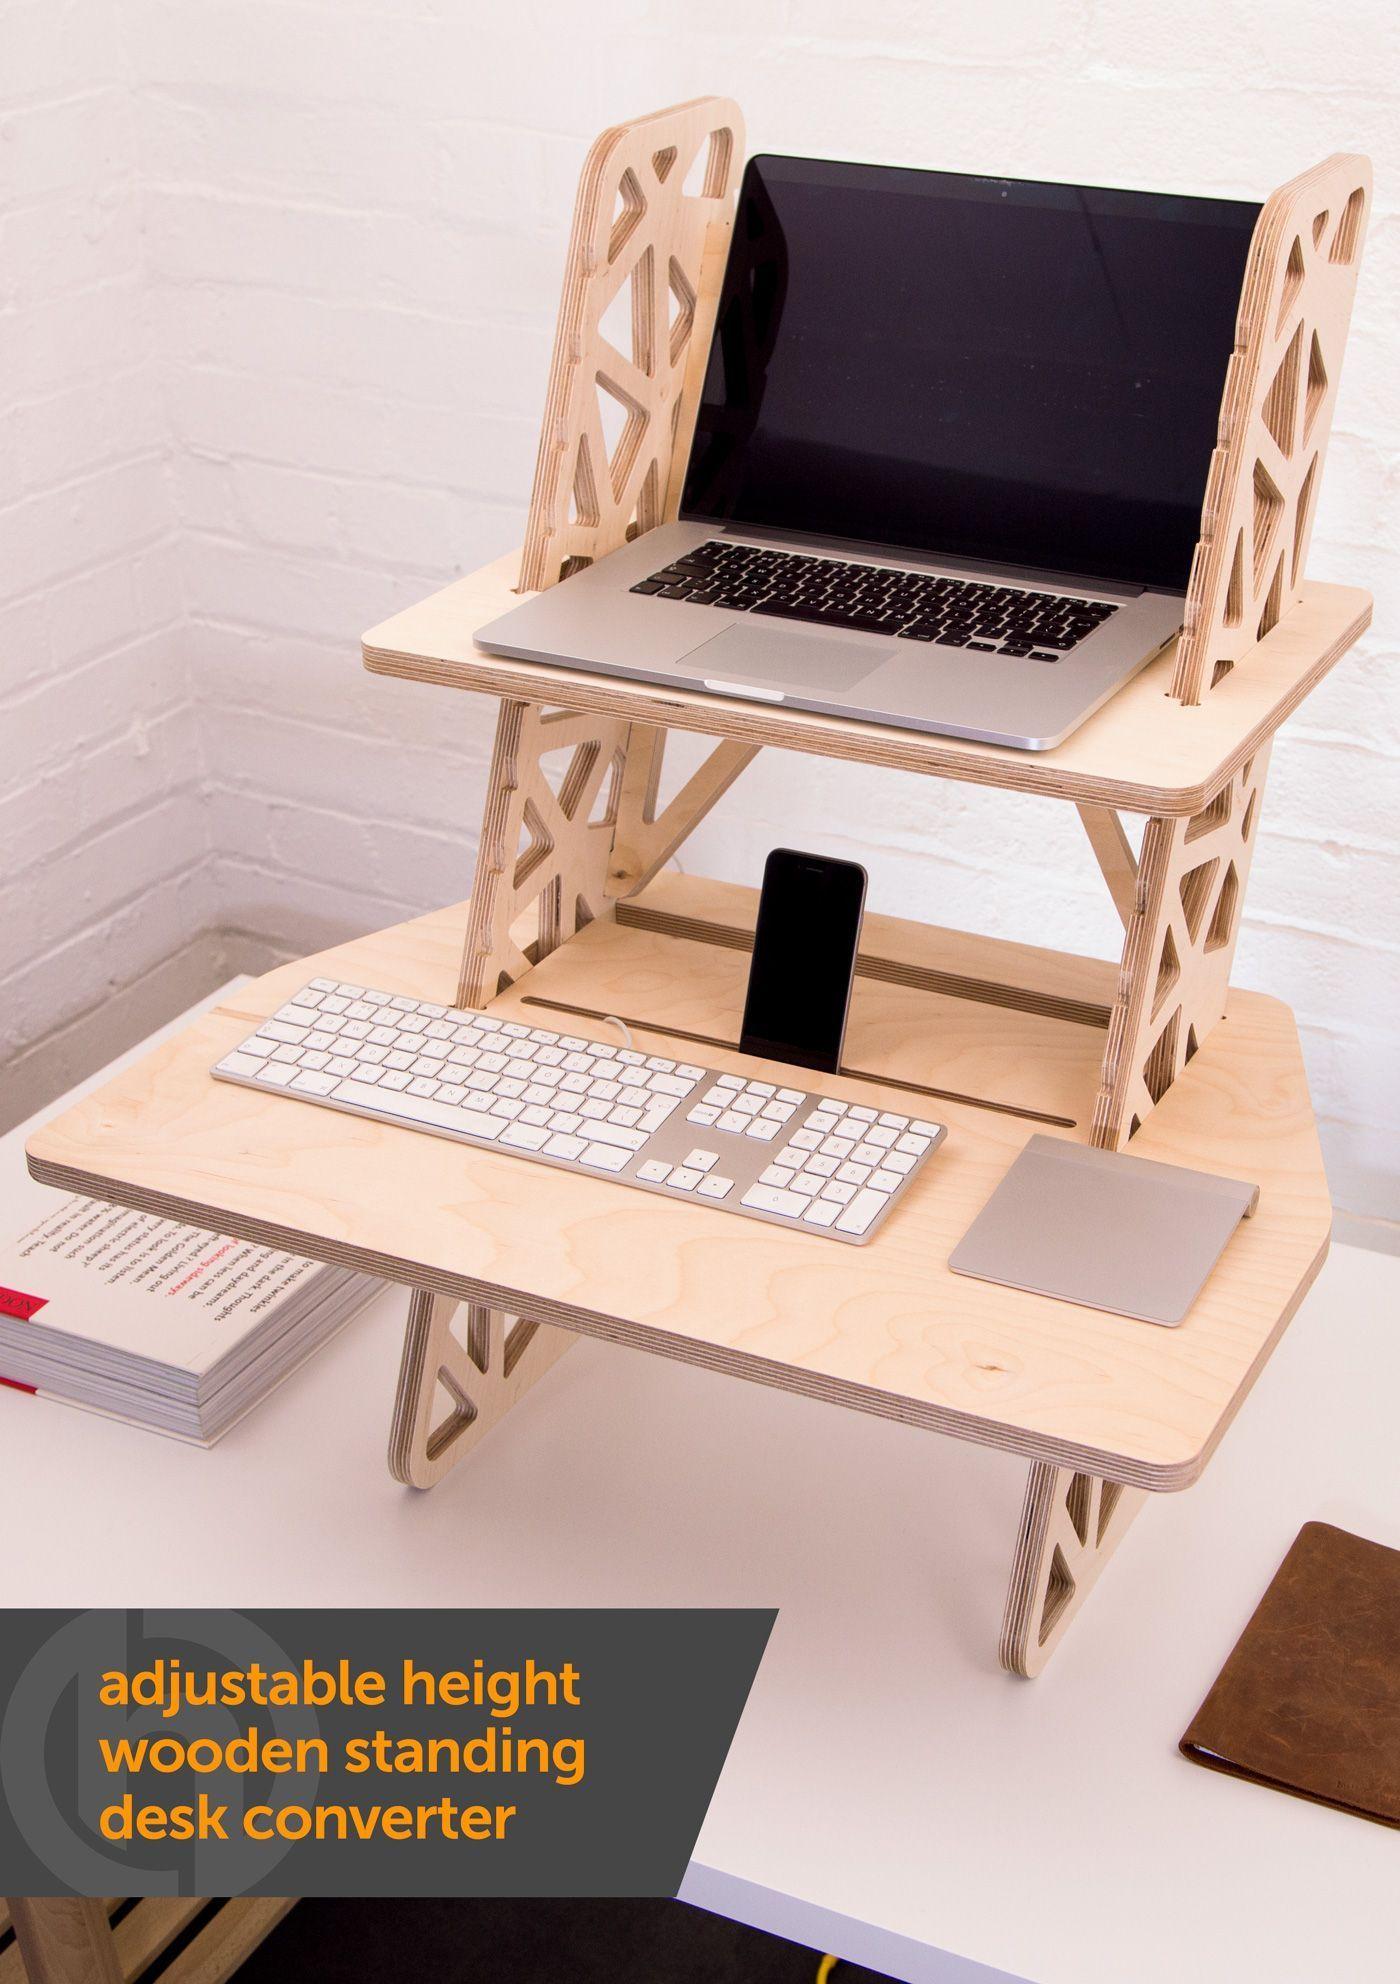 Adjustable height wooden standing desk converter this